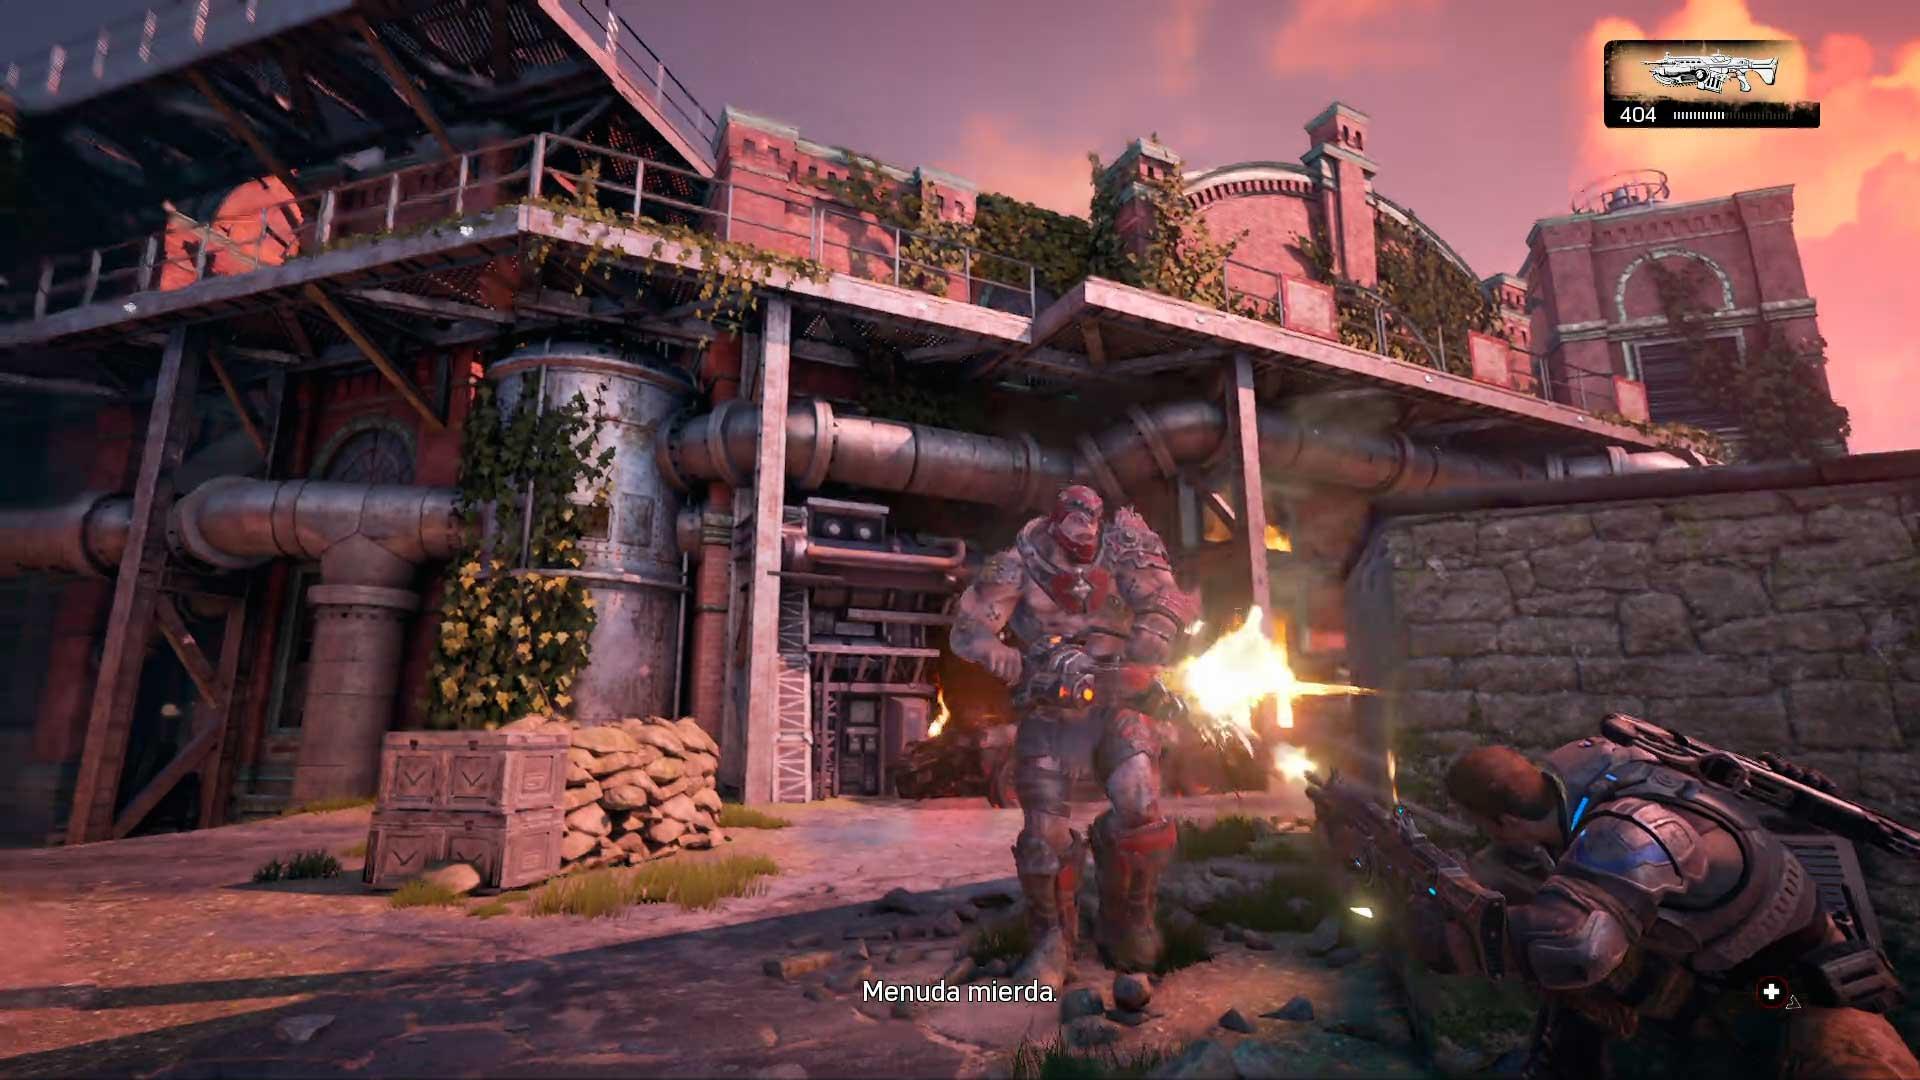 Análisis Gears of War 4 coberturas